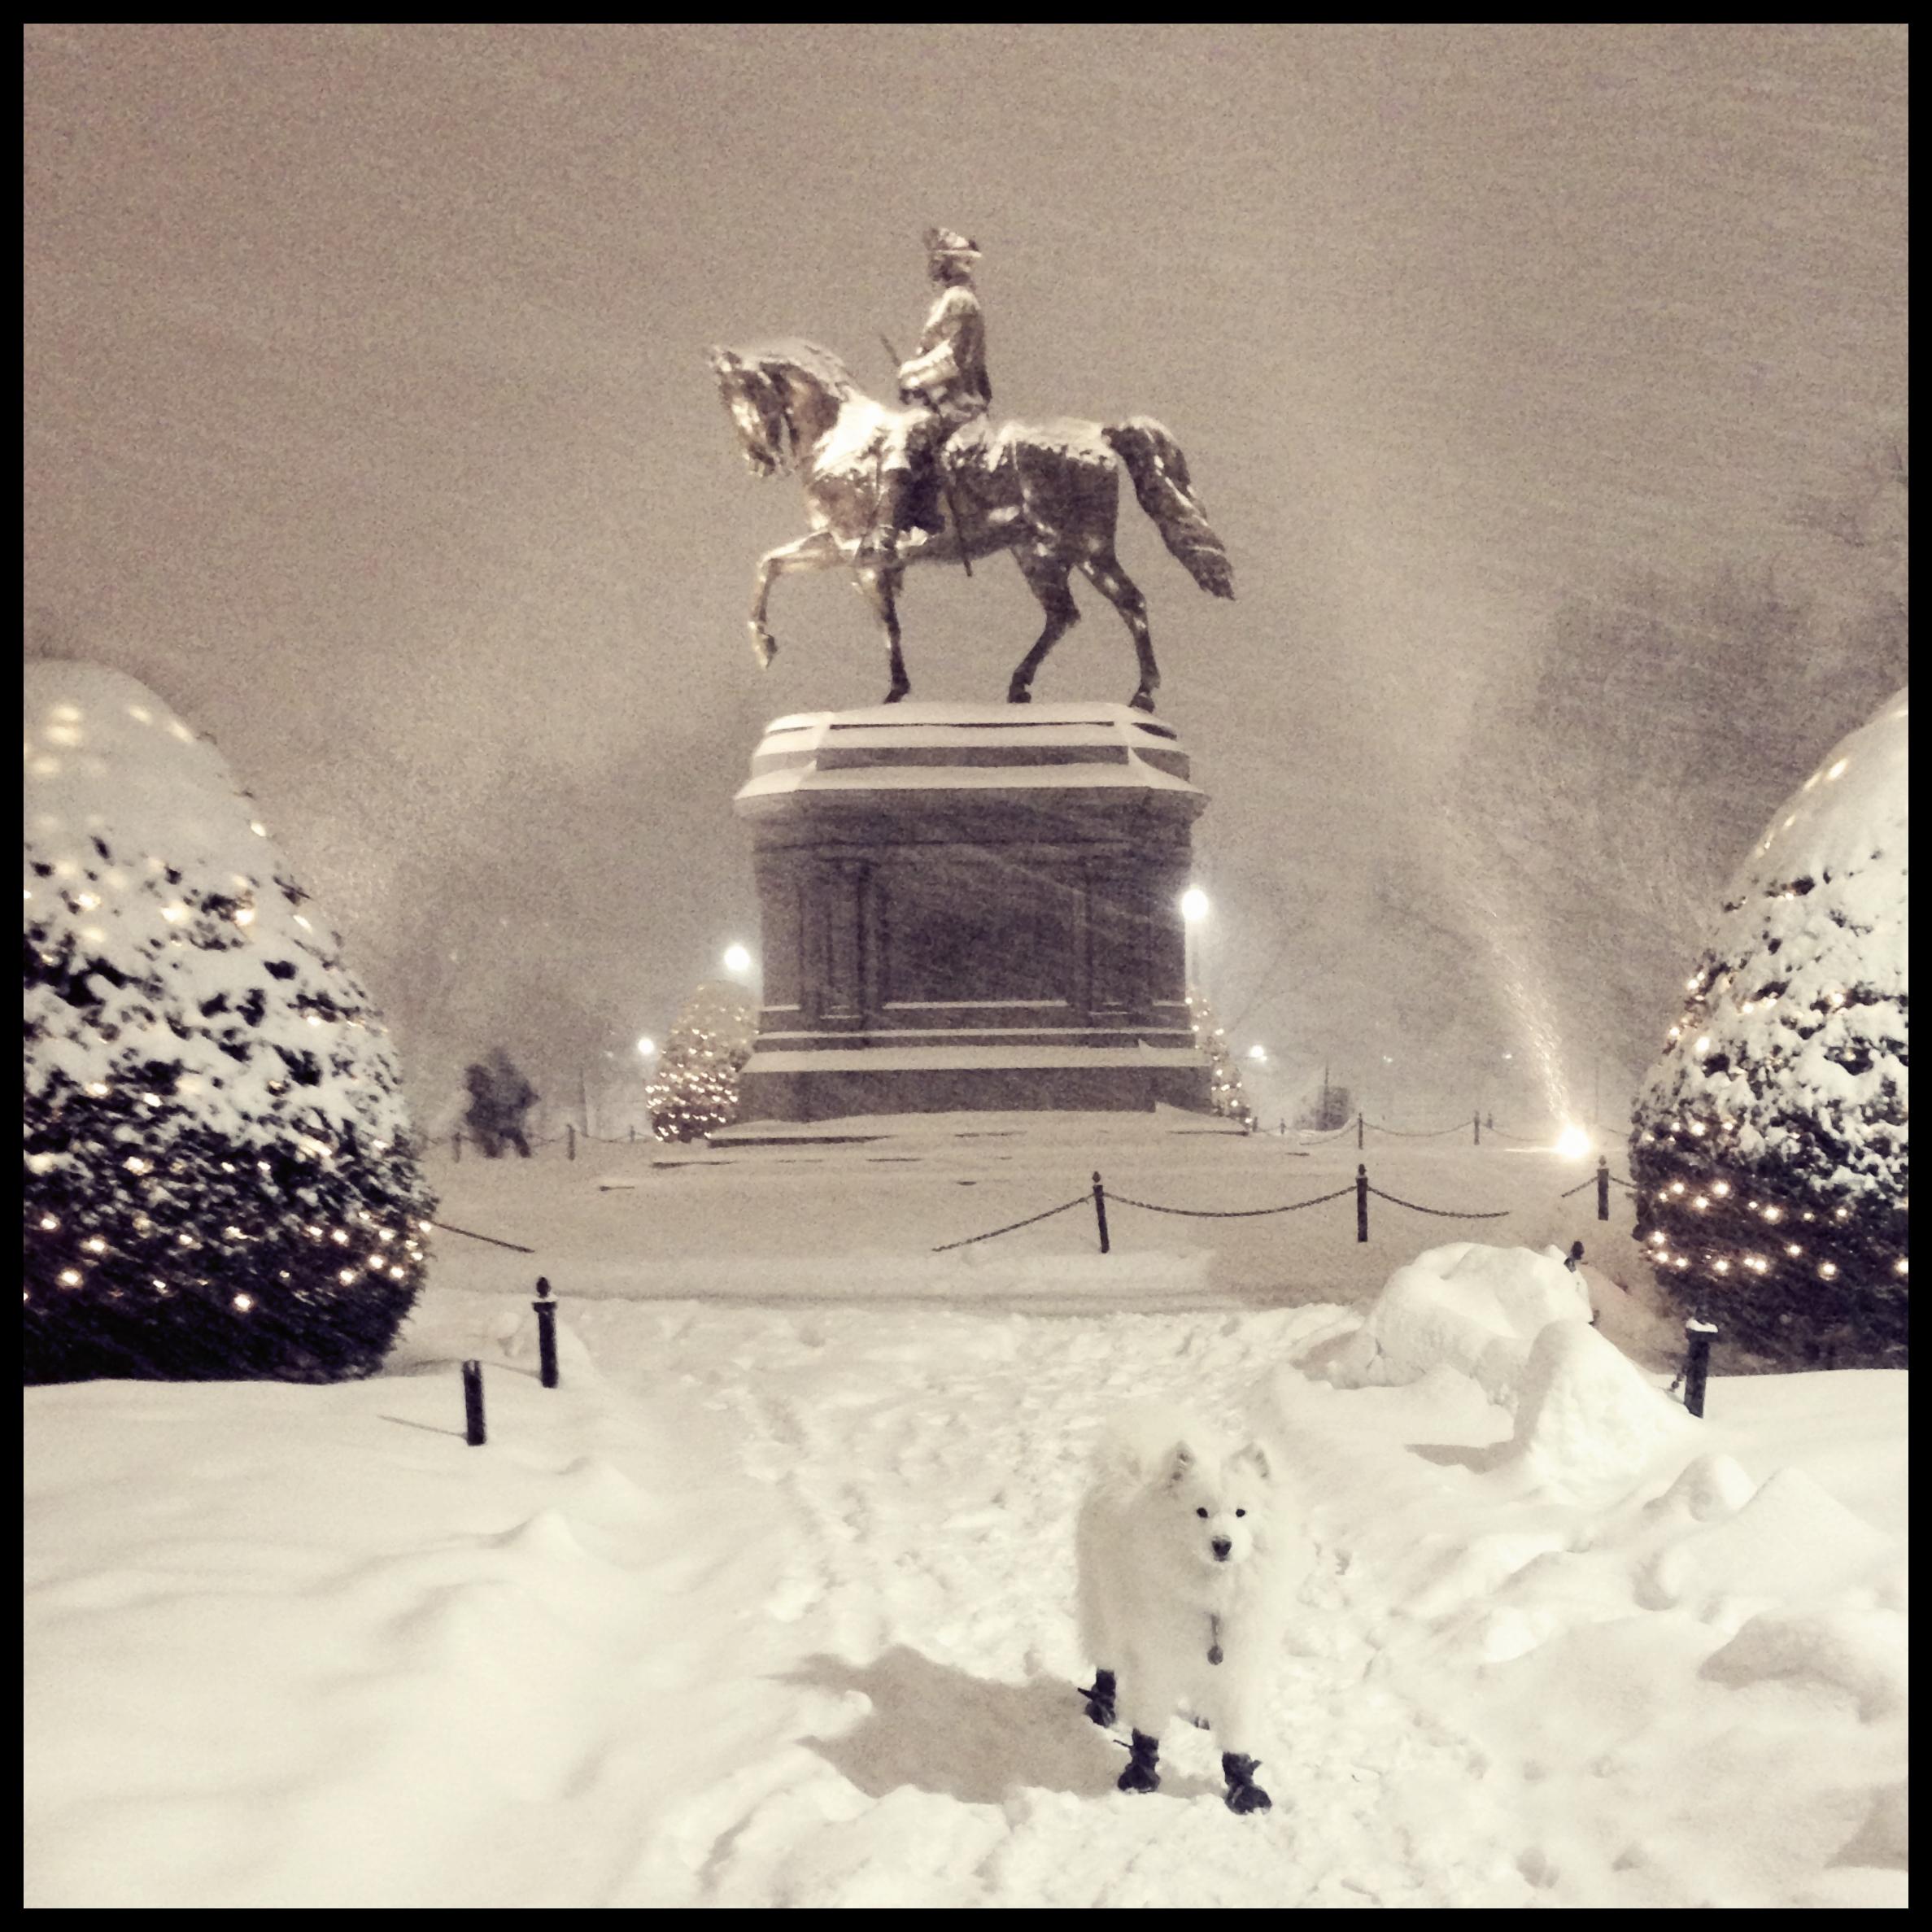 George Washington statue, Boston Public Garden